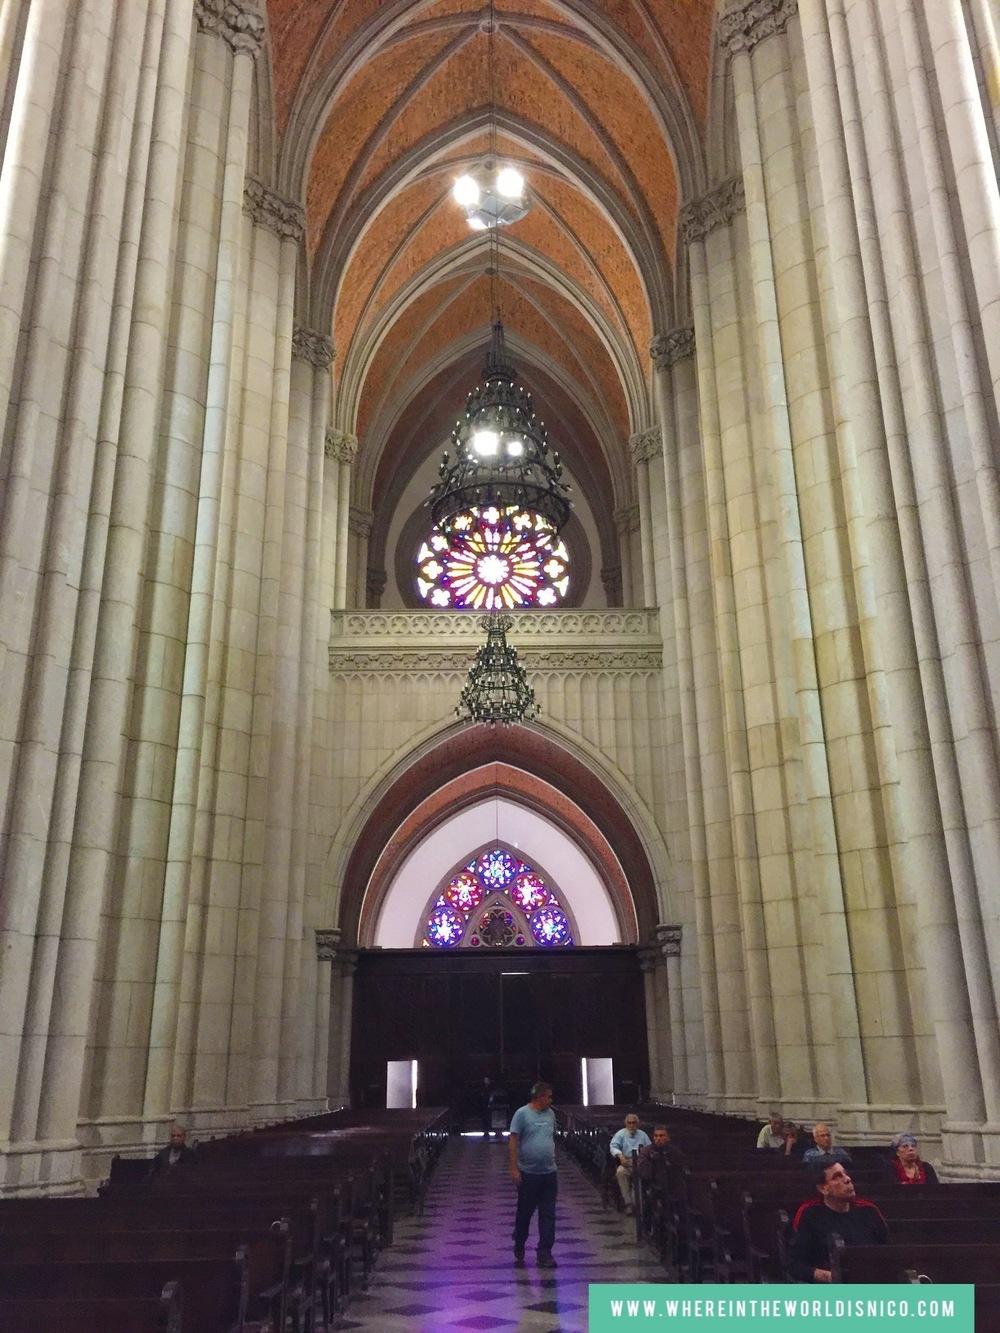 sao-paulo-cathedral-interior.jpg